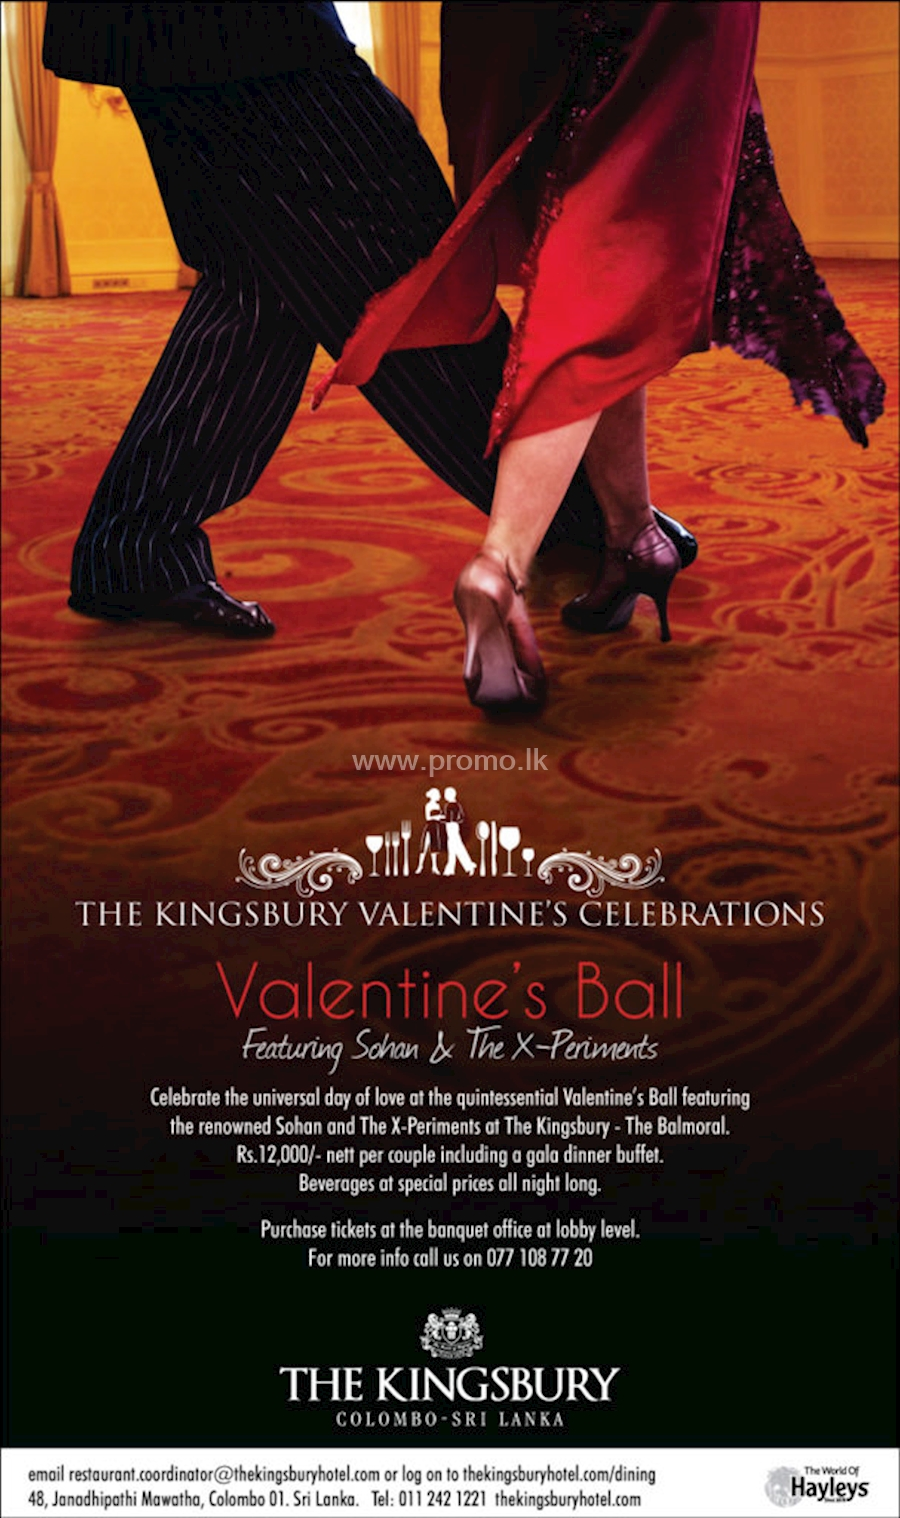 The Kingsbury Valentine's Celebration